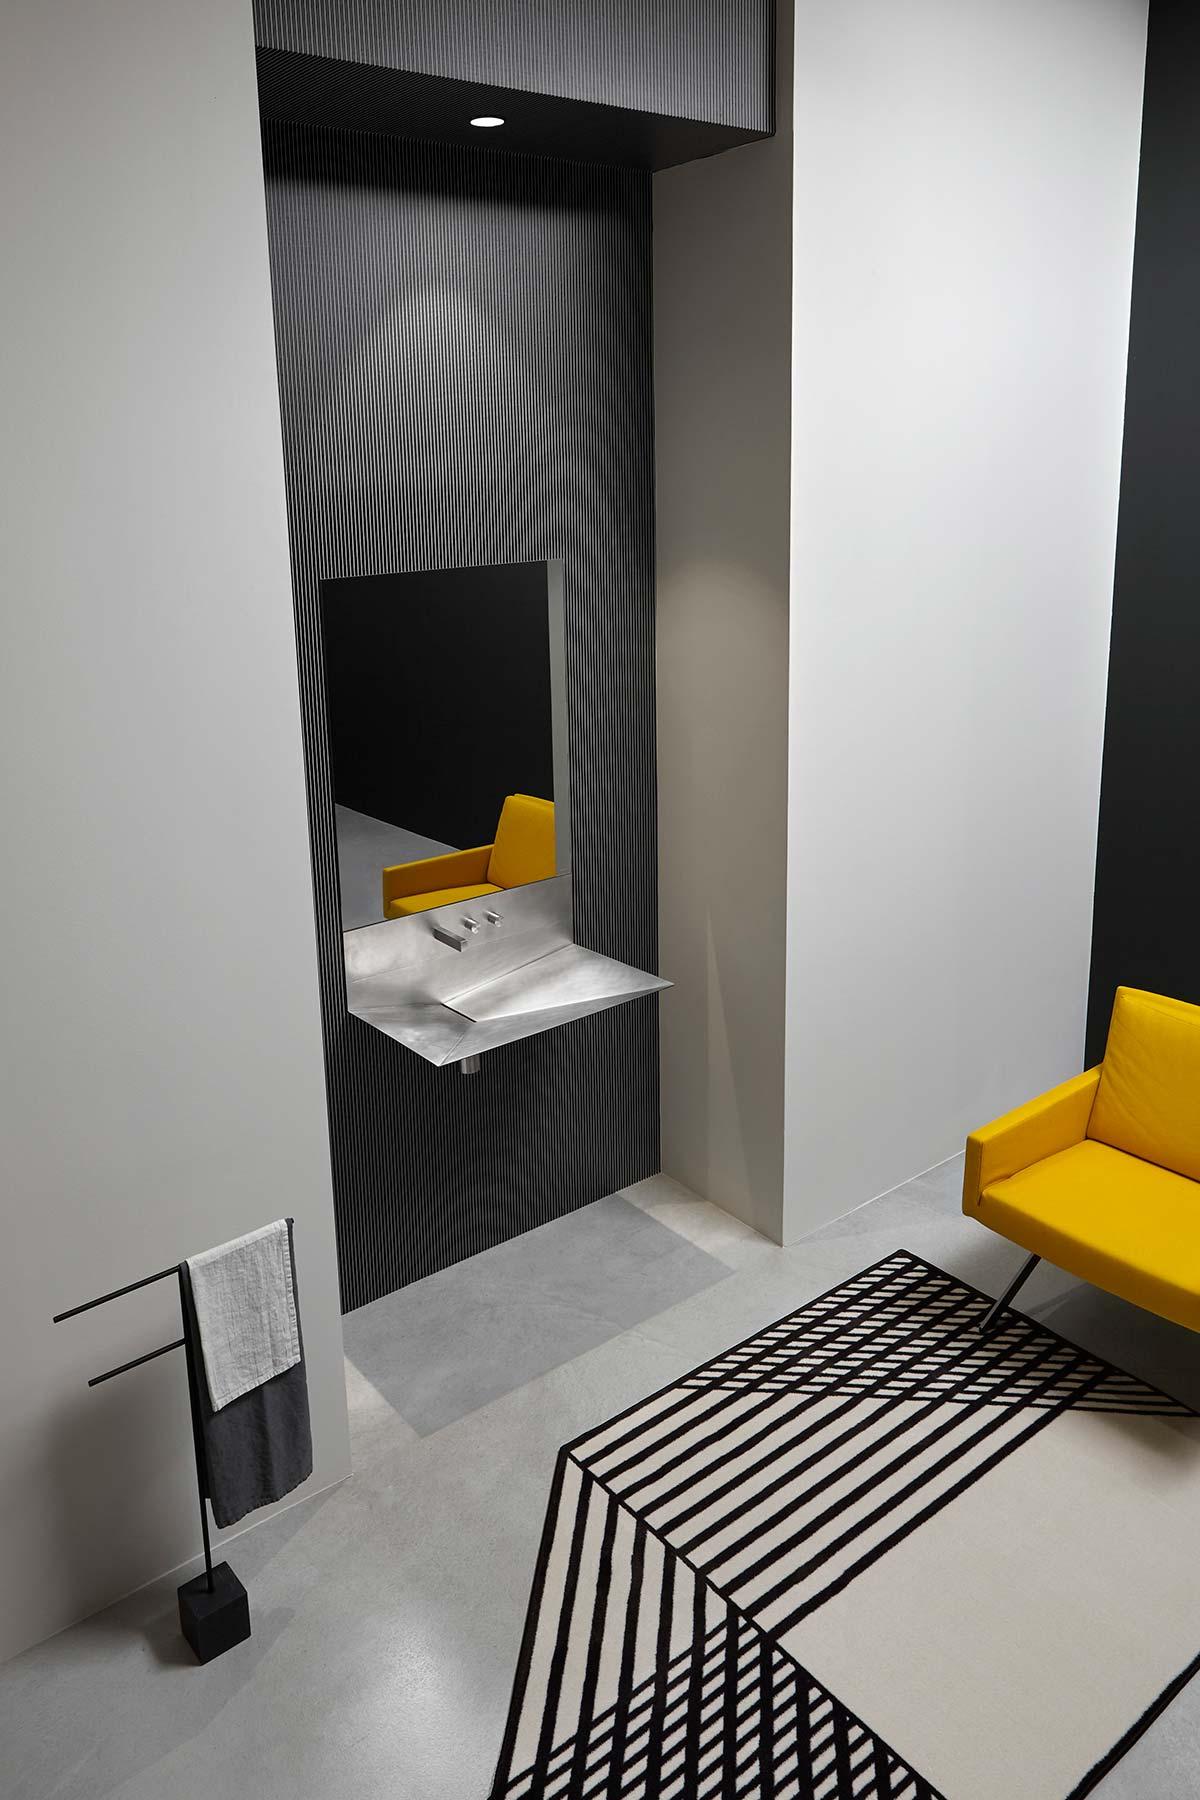 Lavandino by antoniolupi - Design Francesca Braga Rosa & Ivano Vianello